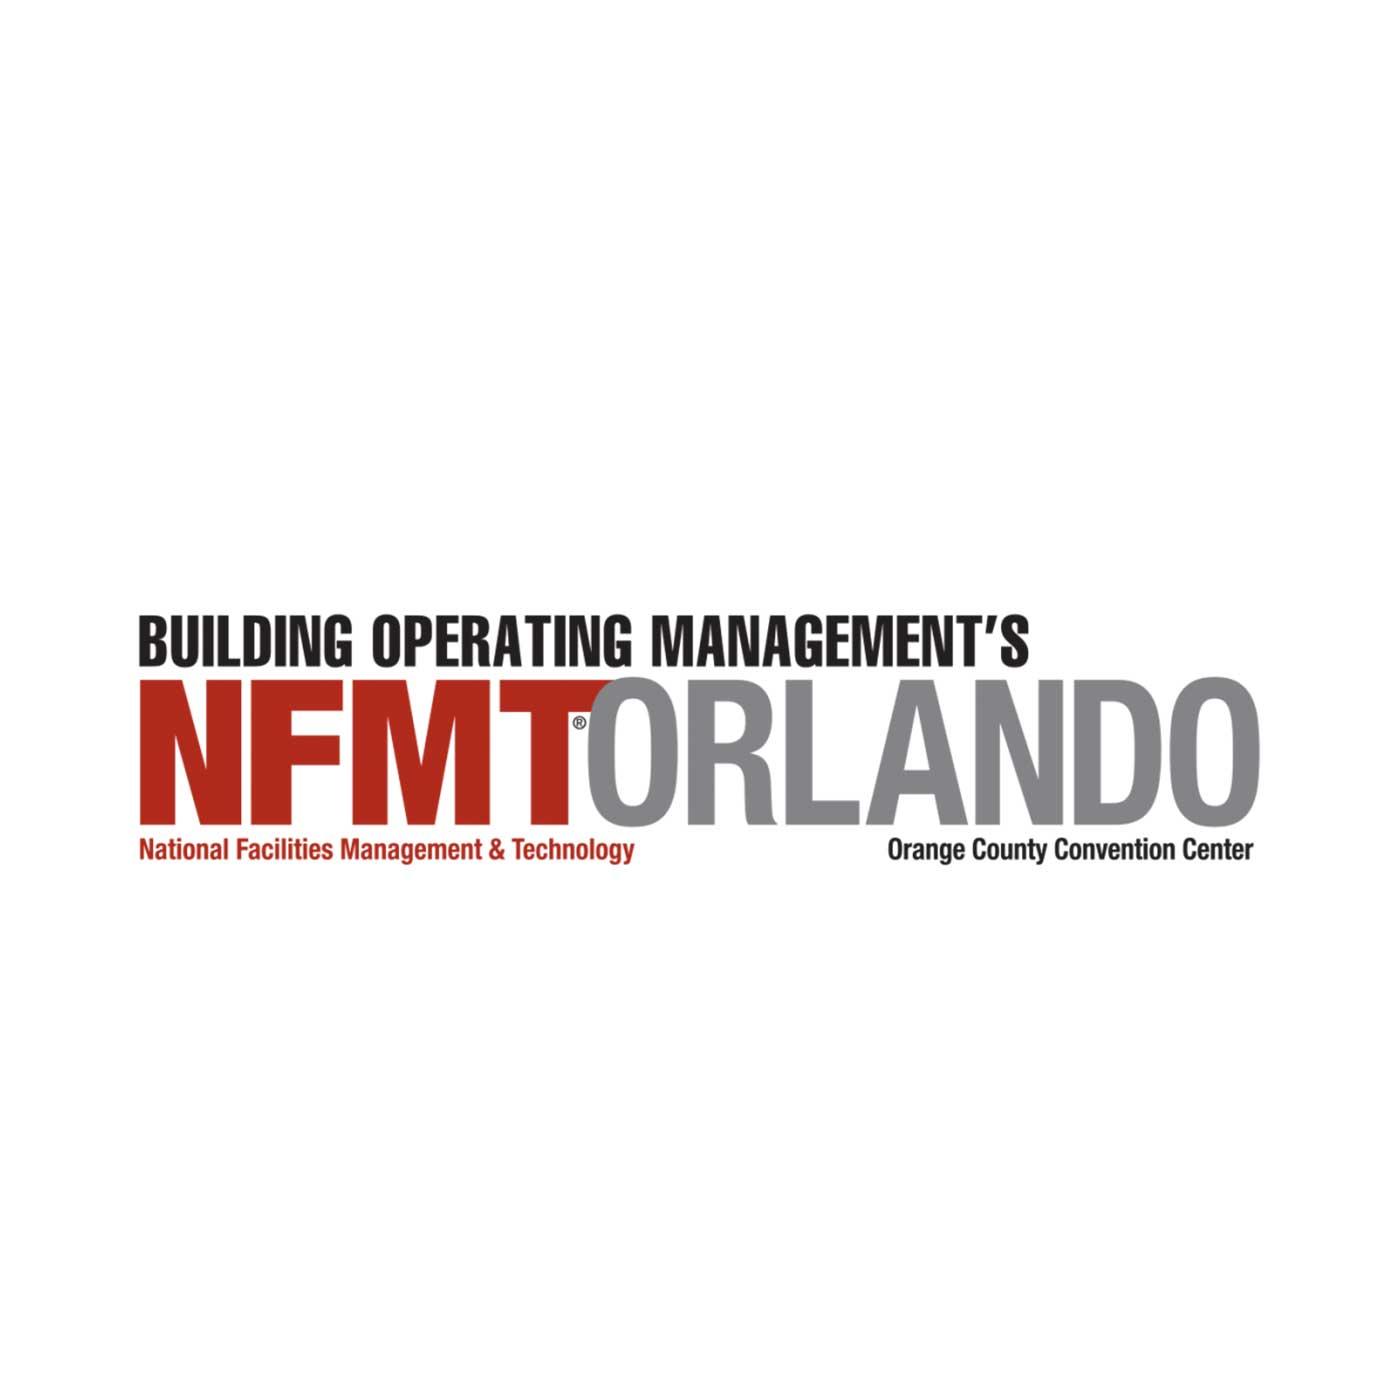 NFMT Orlando